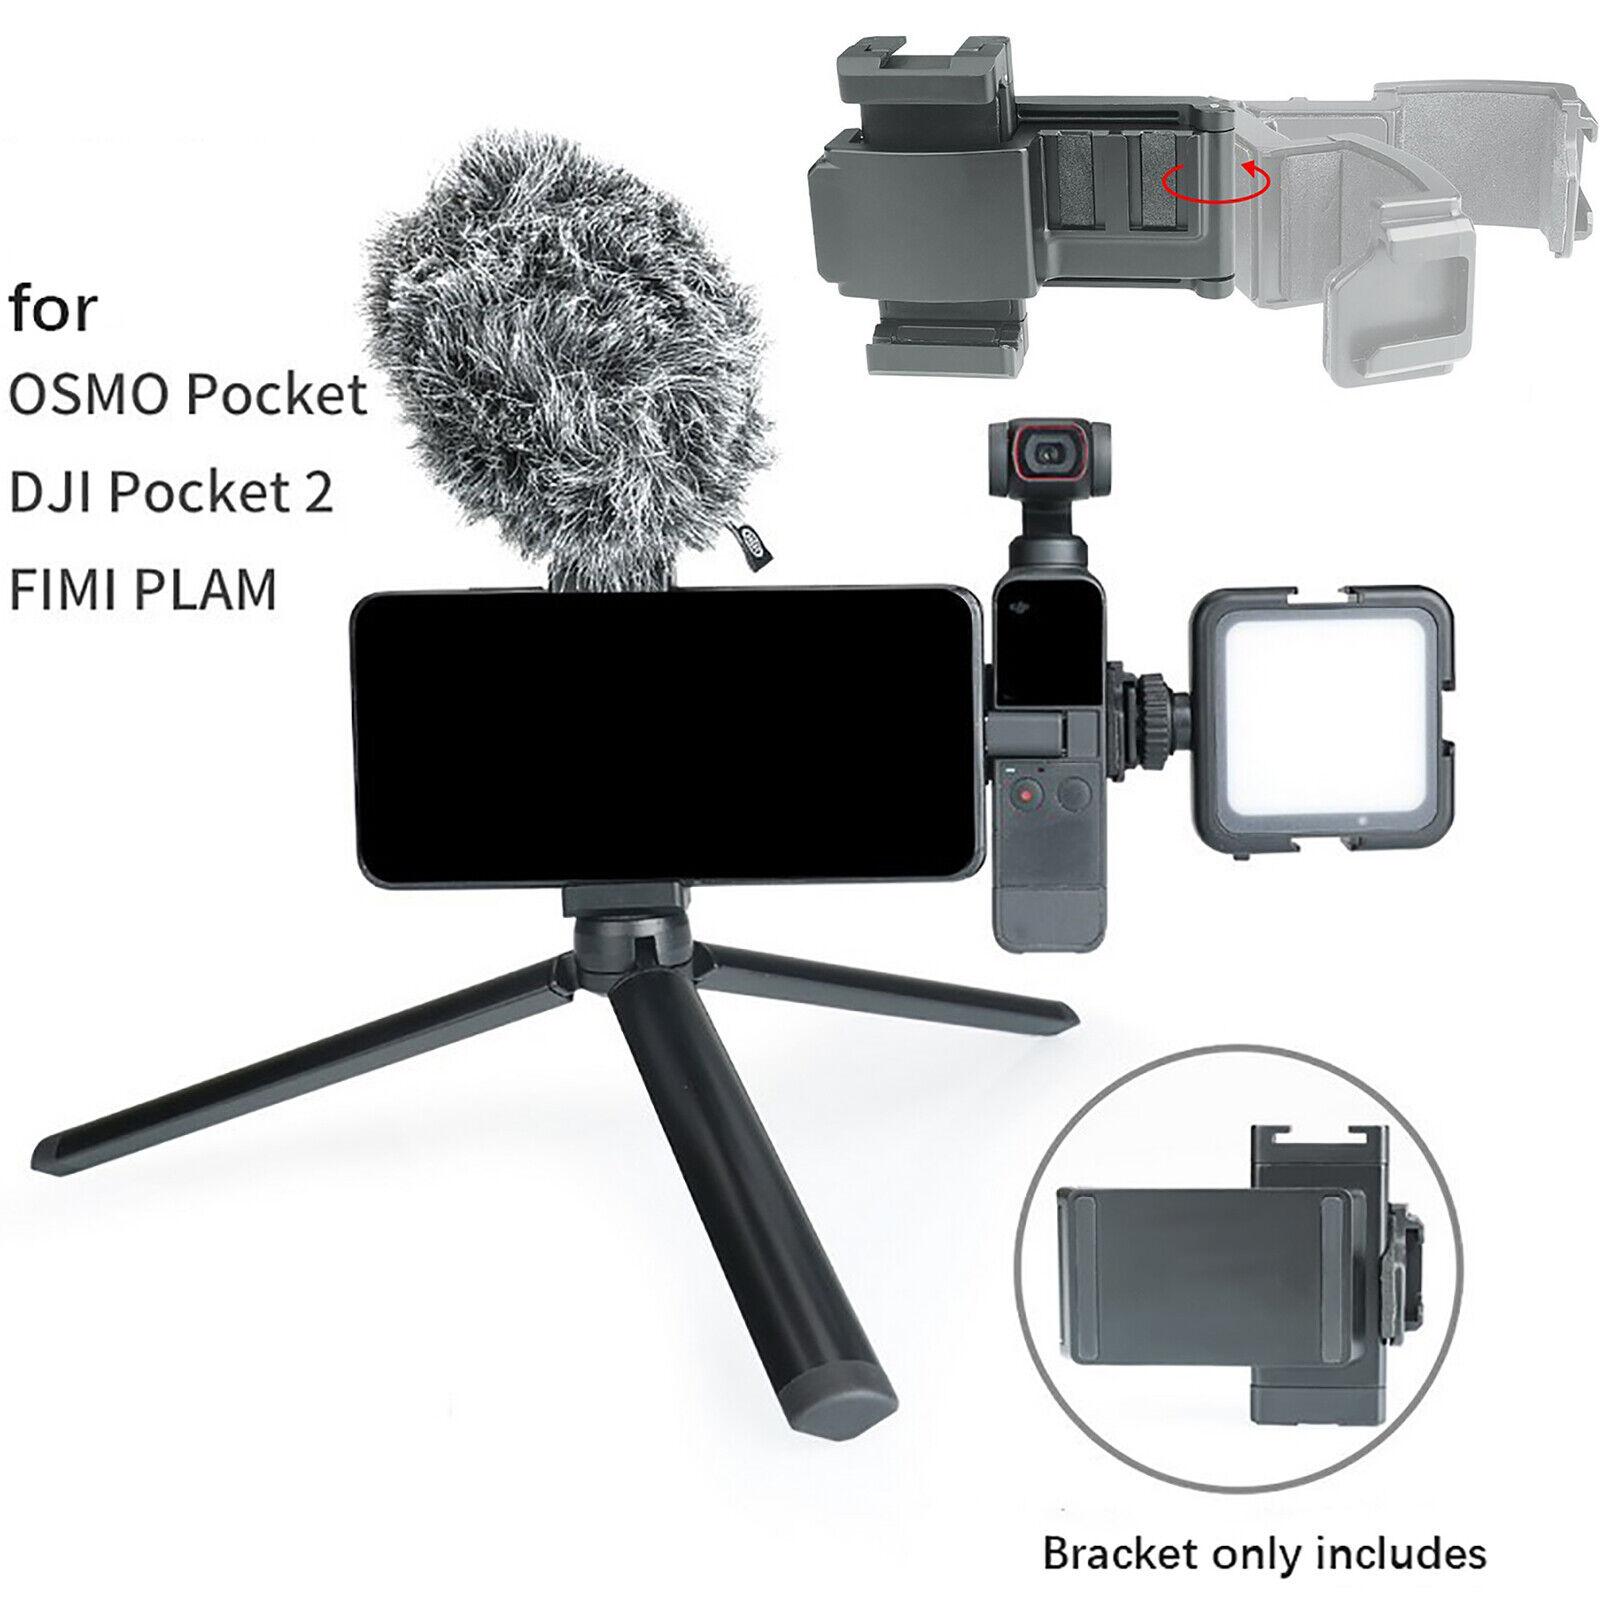 Telescopic Phone Holder Extension Bracket Stand for DJI OSMO Pocket 2 FIMI PLAM